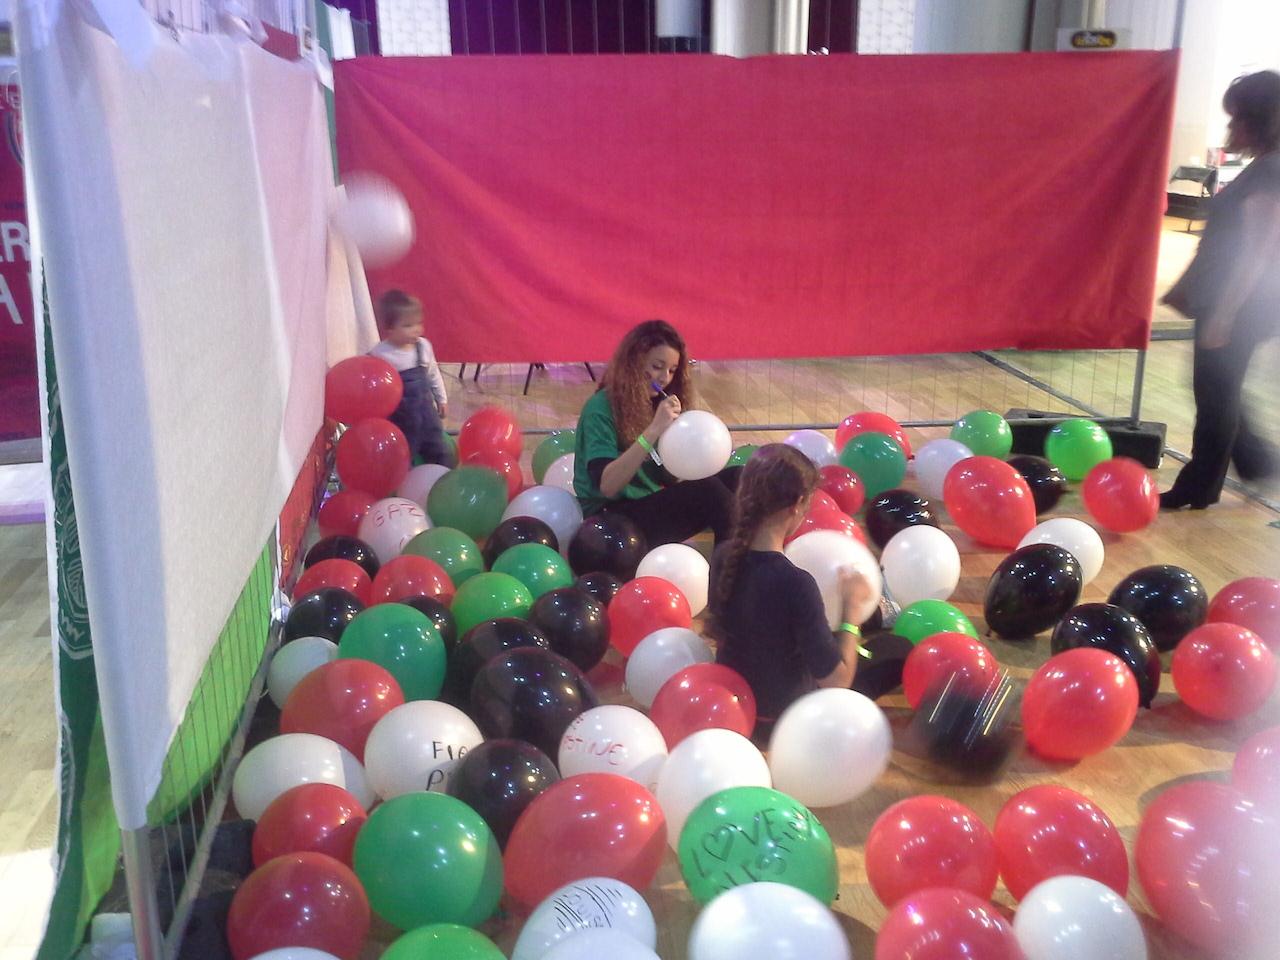 ballons_free_palestine.jpg